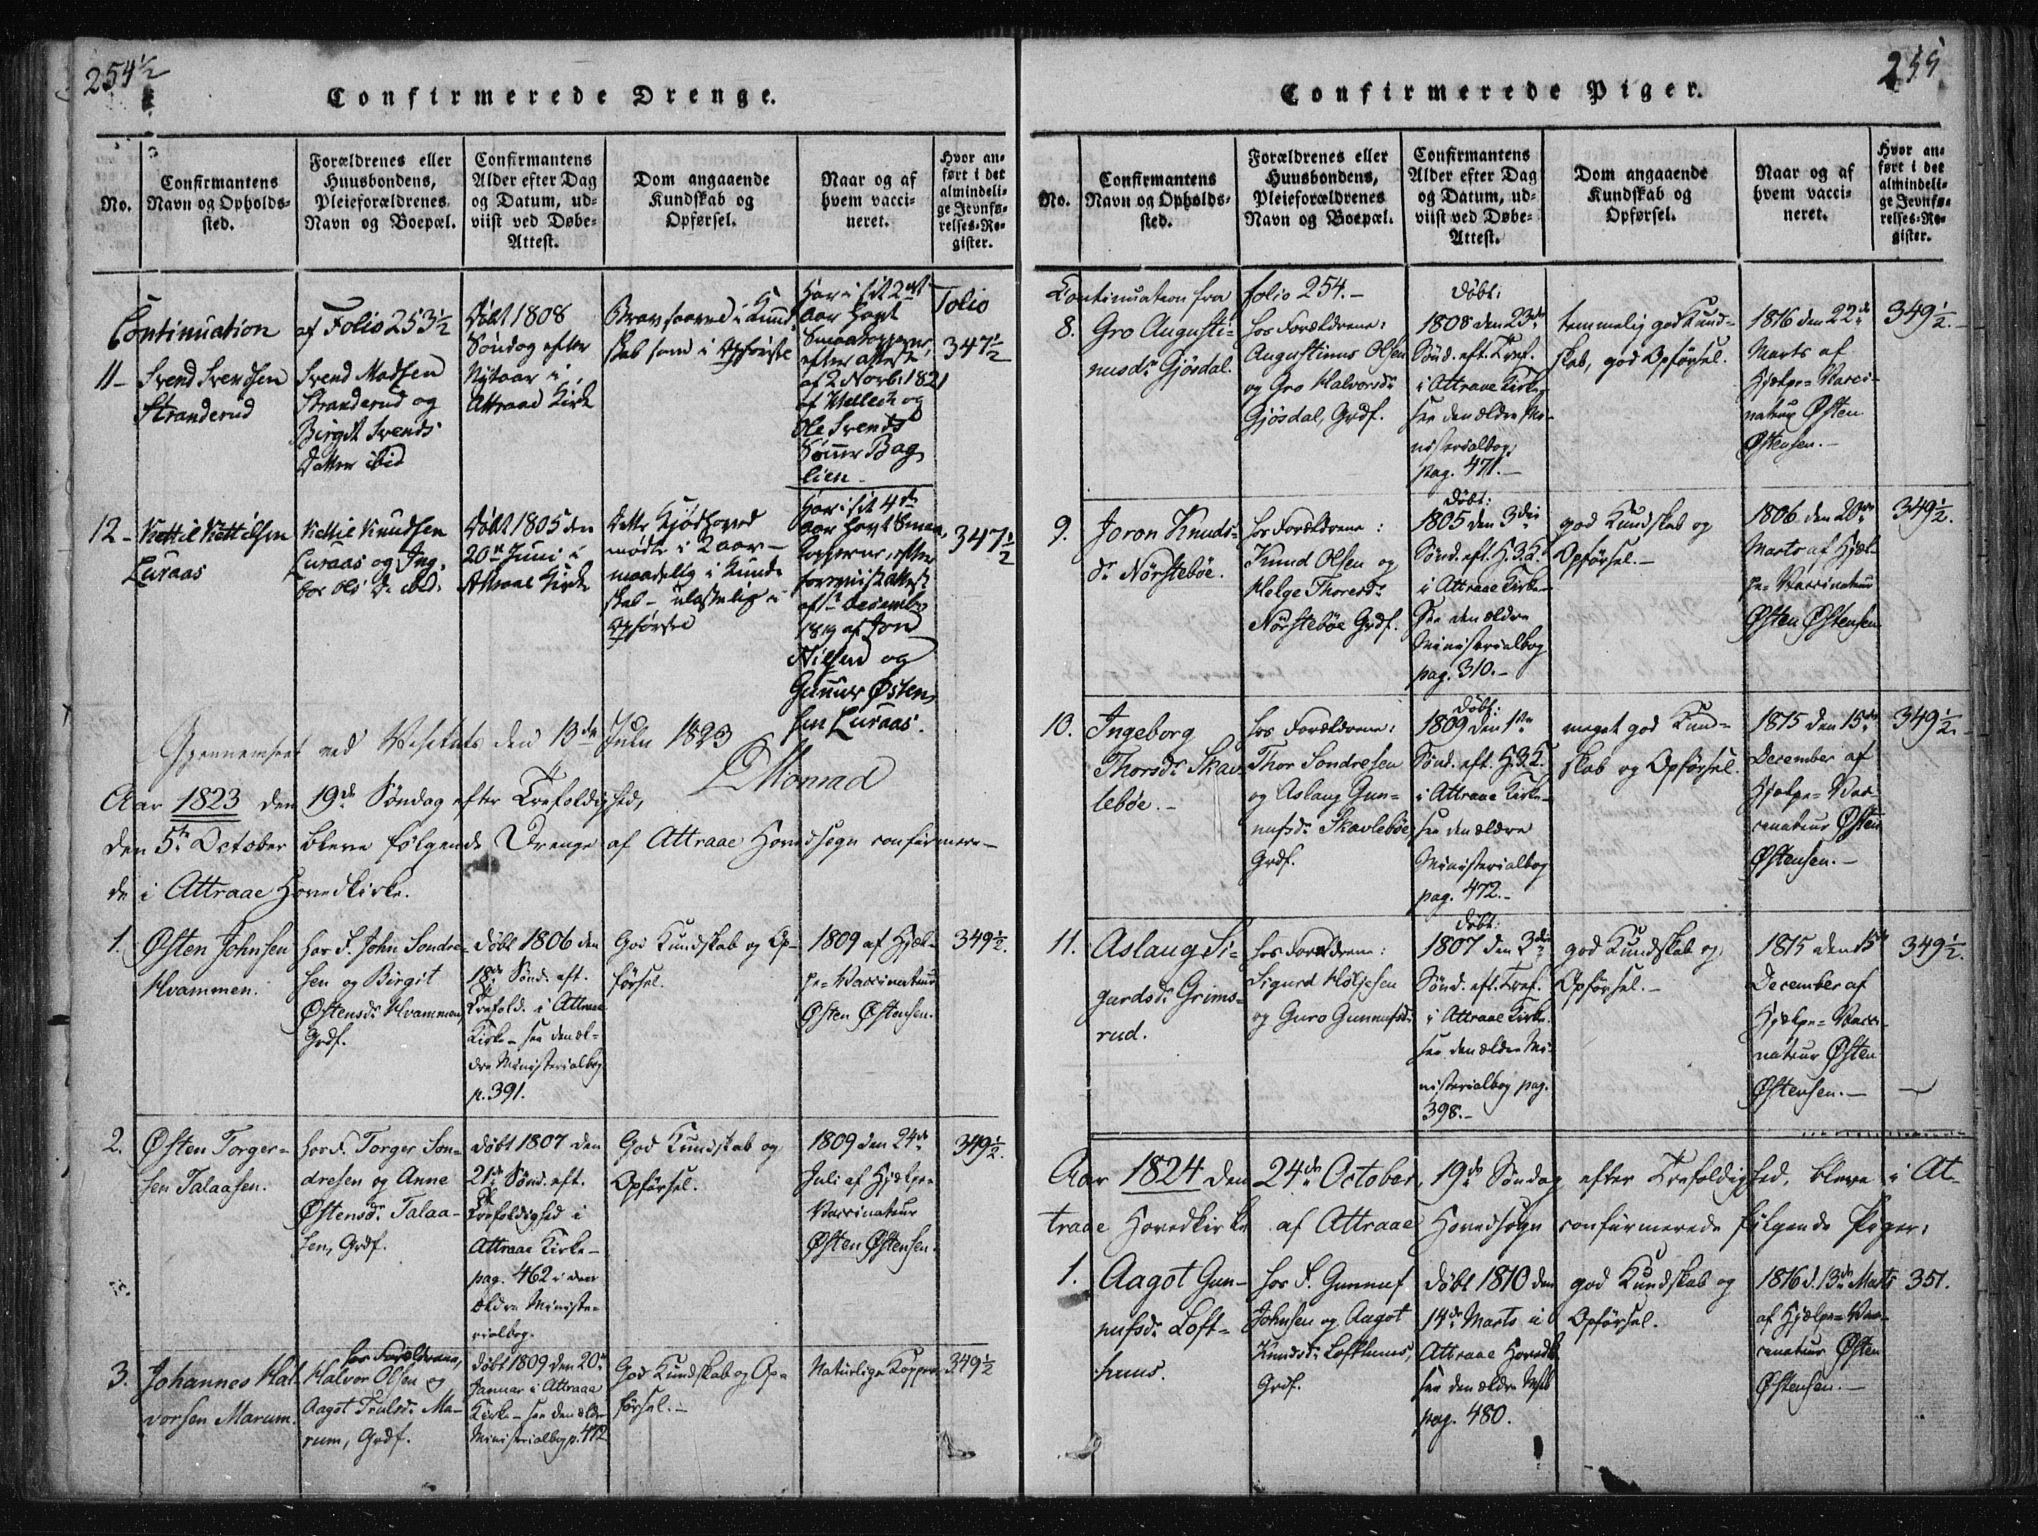 SAKO, Tinn kirkebøker, F/Fa/L0004: Ministerialbok nr. I 4, 1815-1843, s. 255